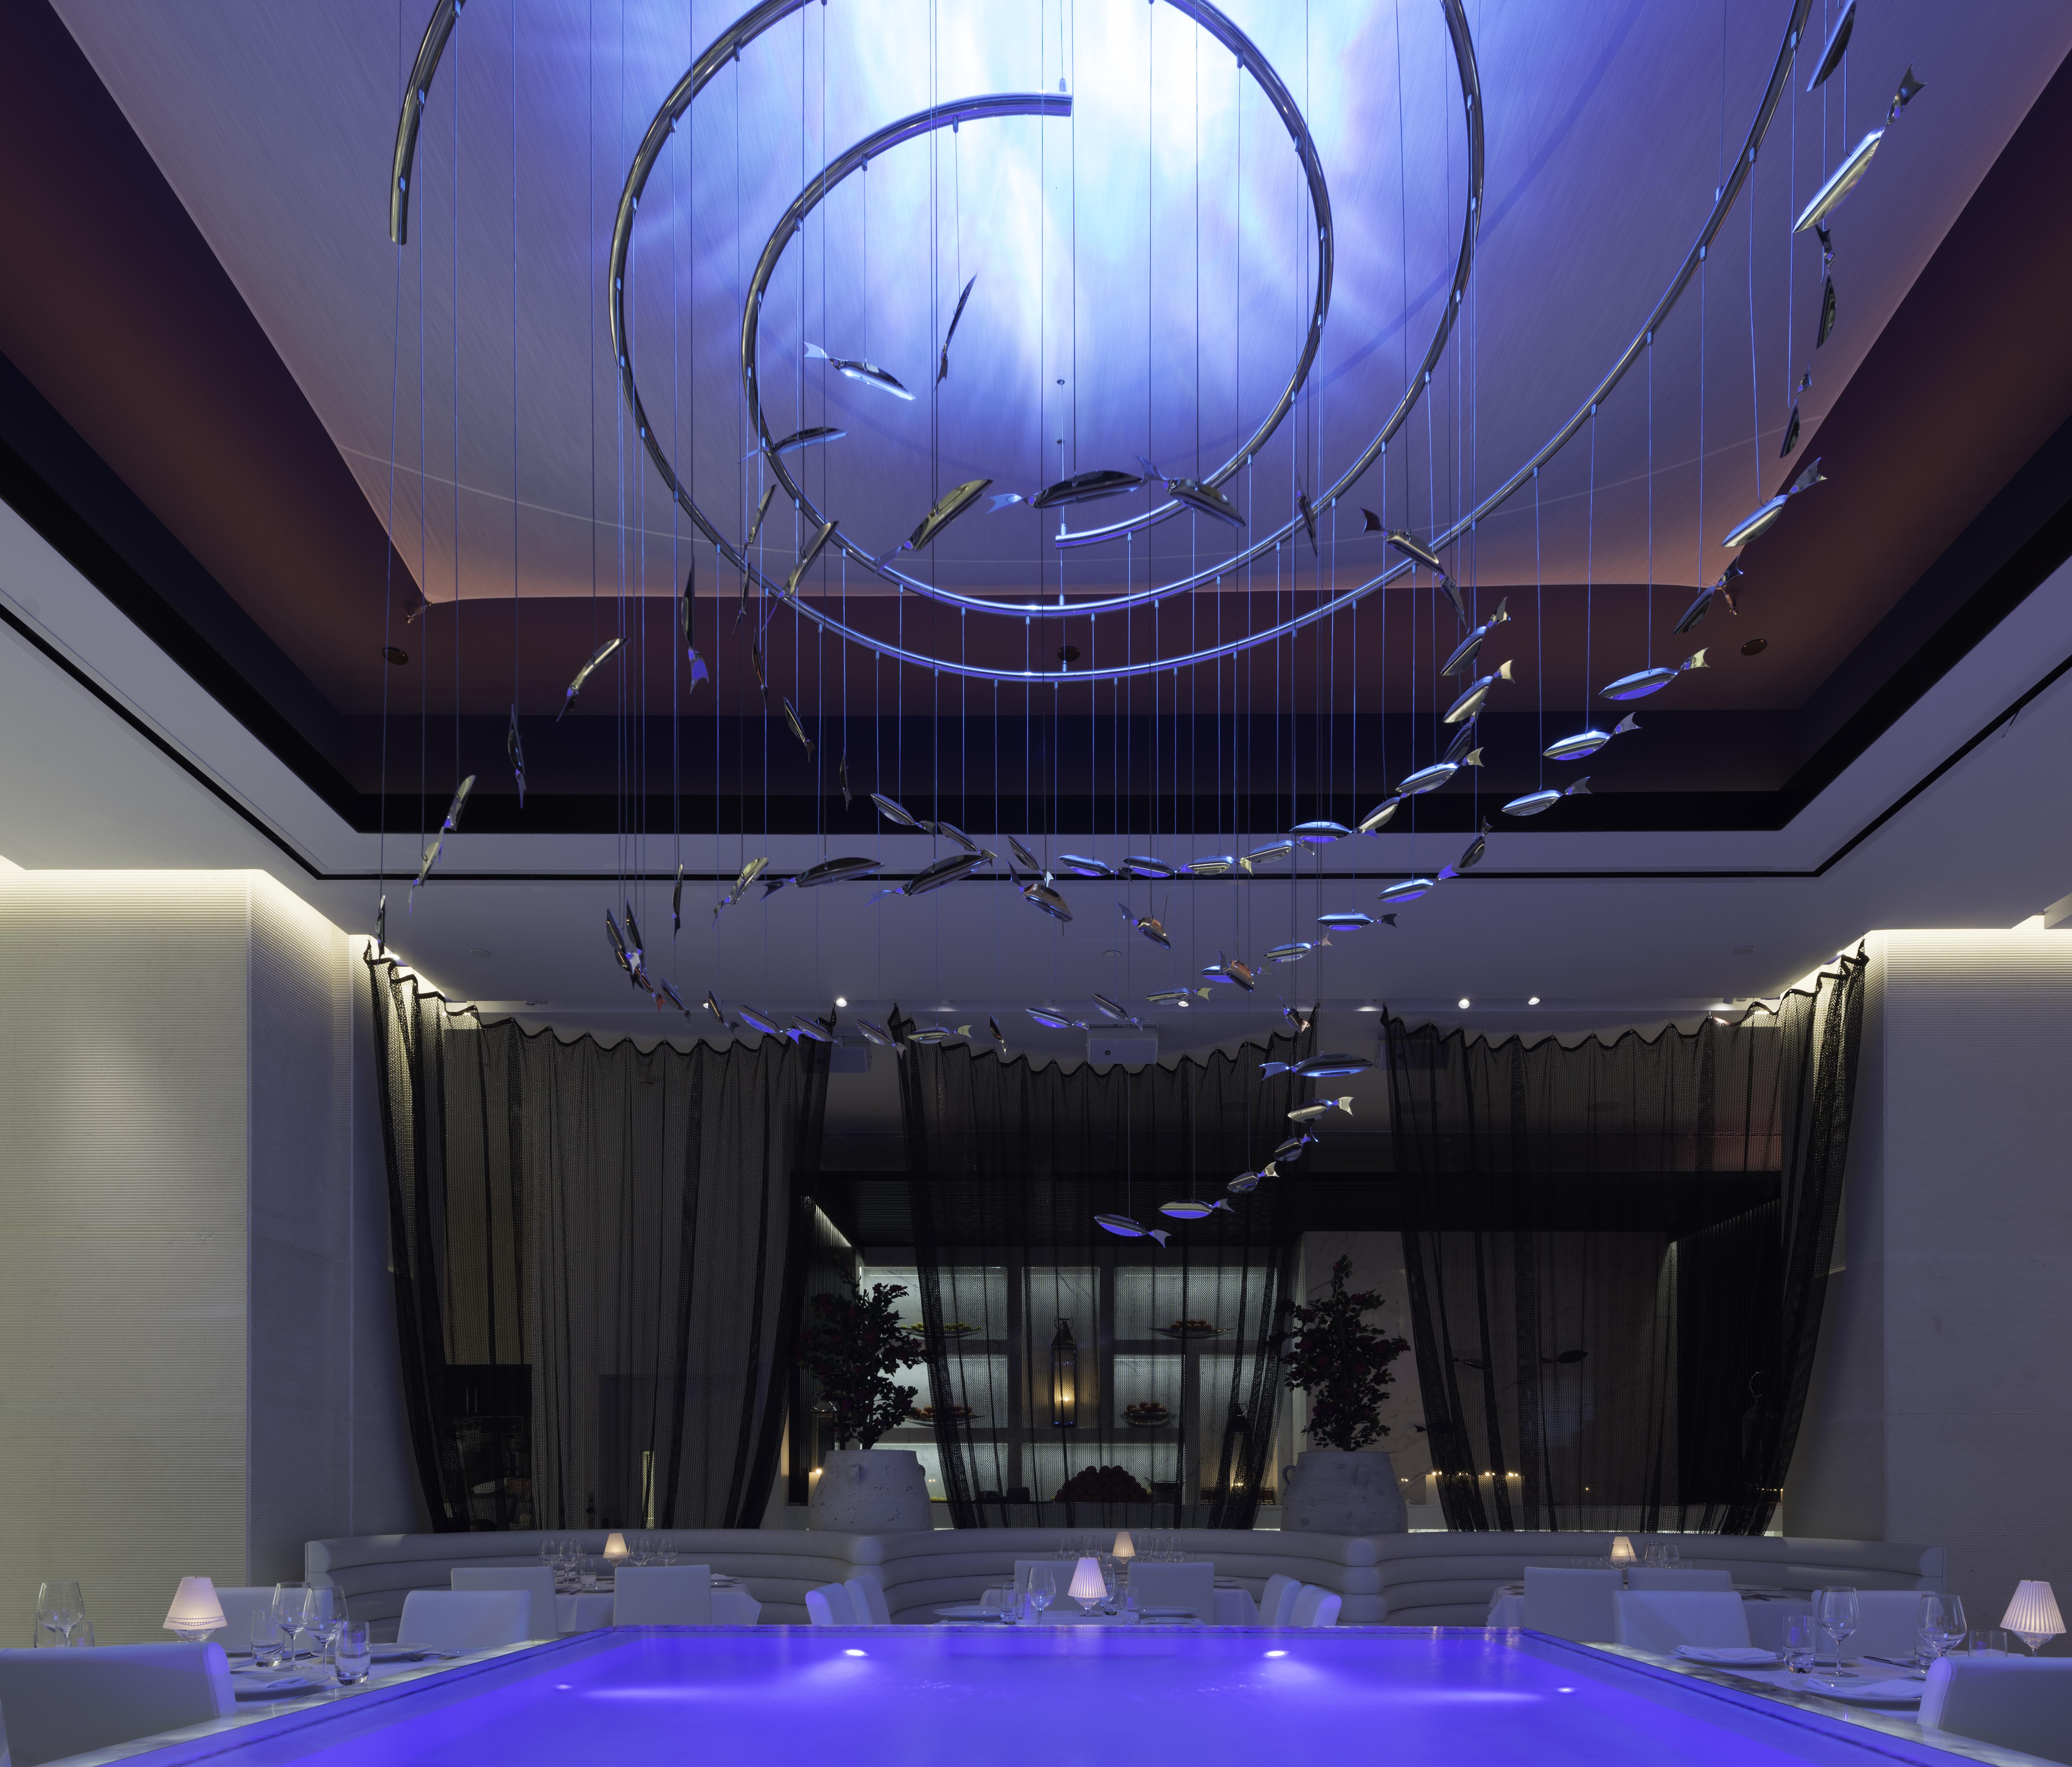 Negative edge reflecting pool at Limani Restaurant, Rockefeller Center, New York City.